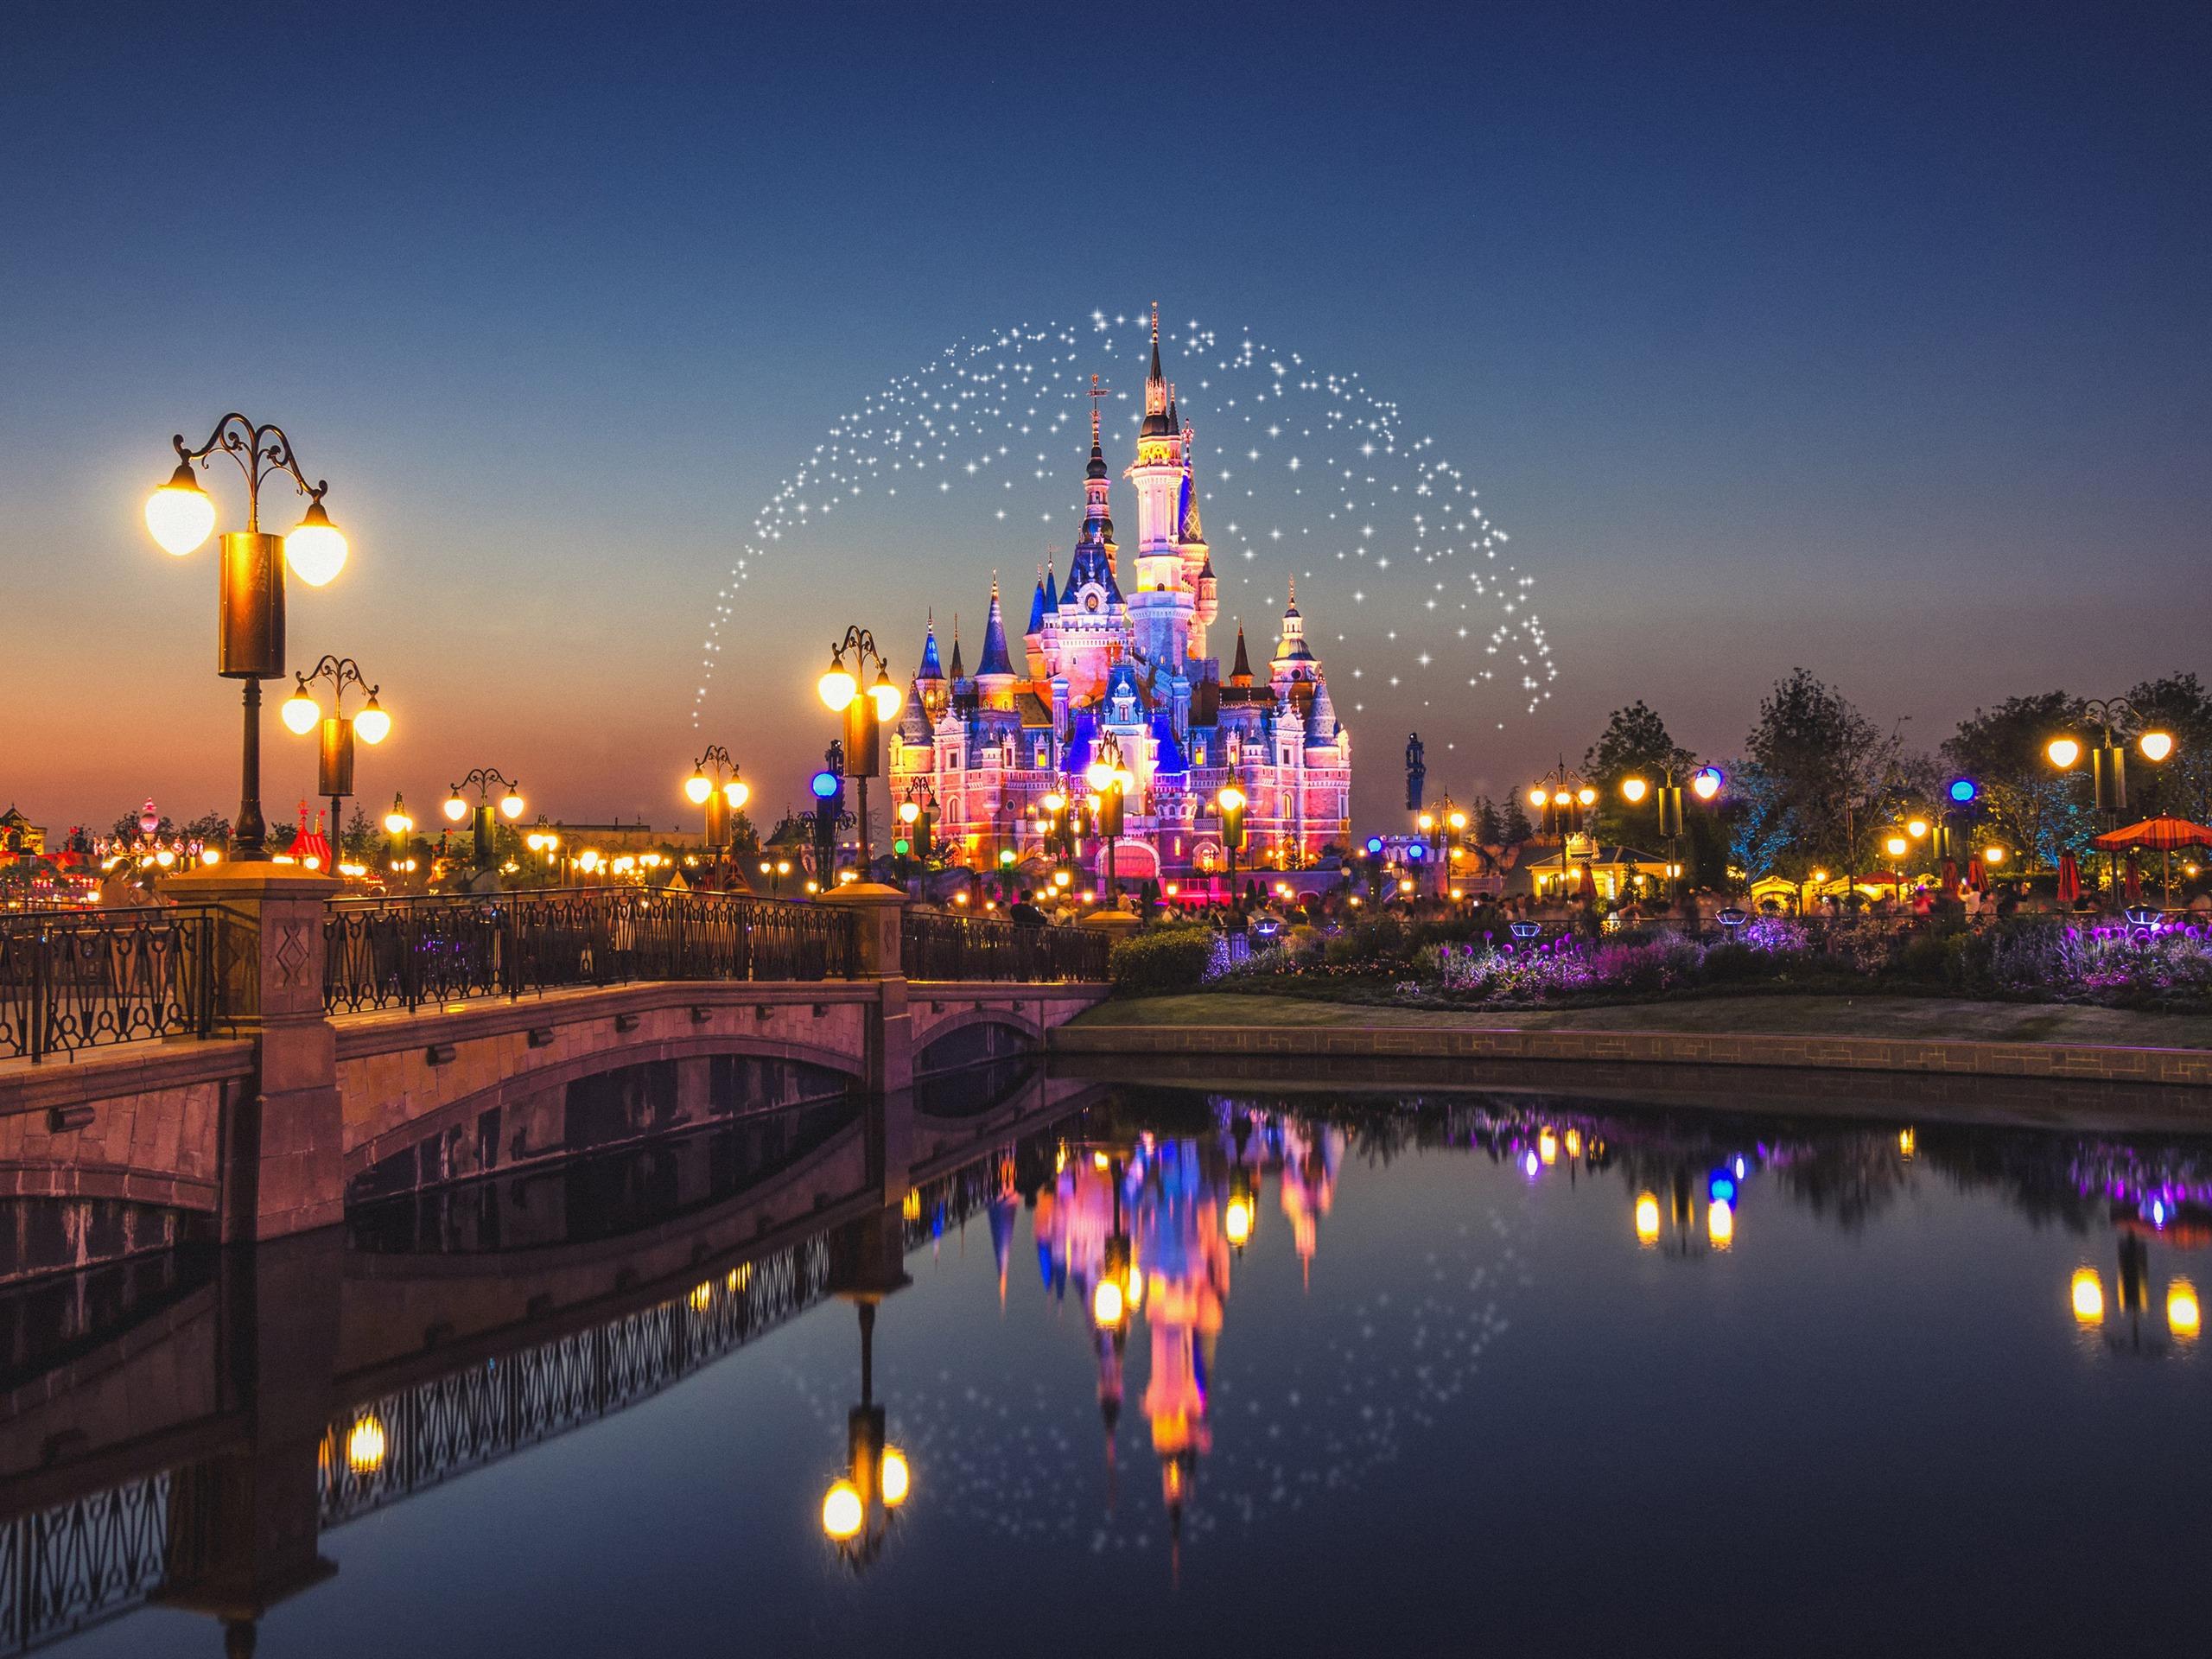 China Shanghai Disneyland Castle Night Preview 10wallpaper Com